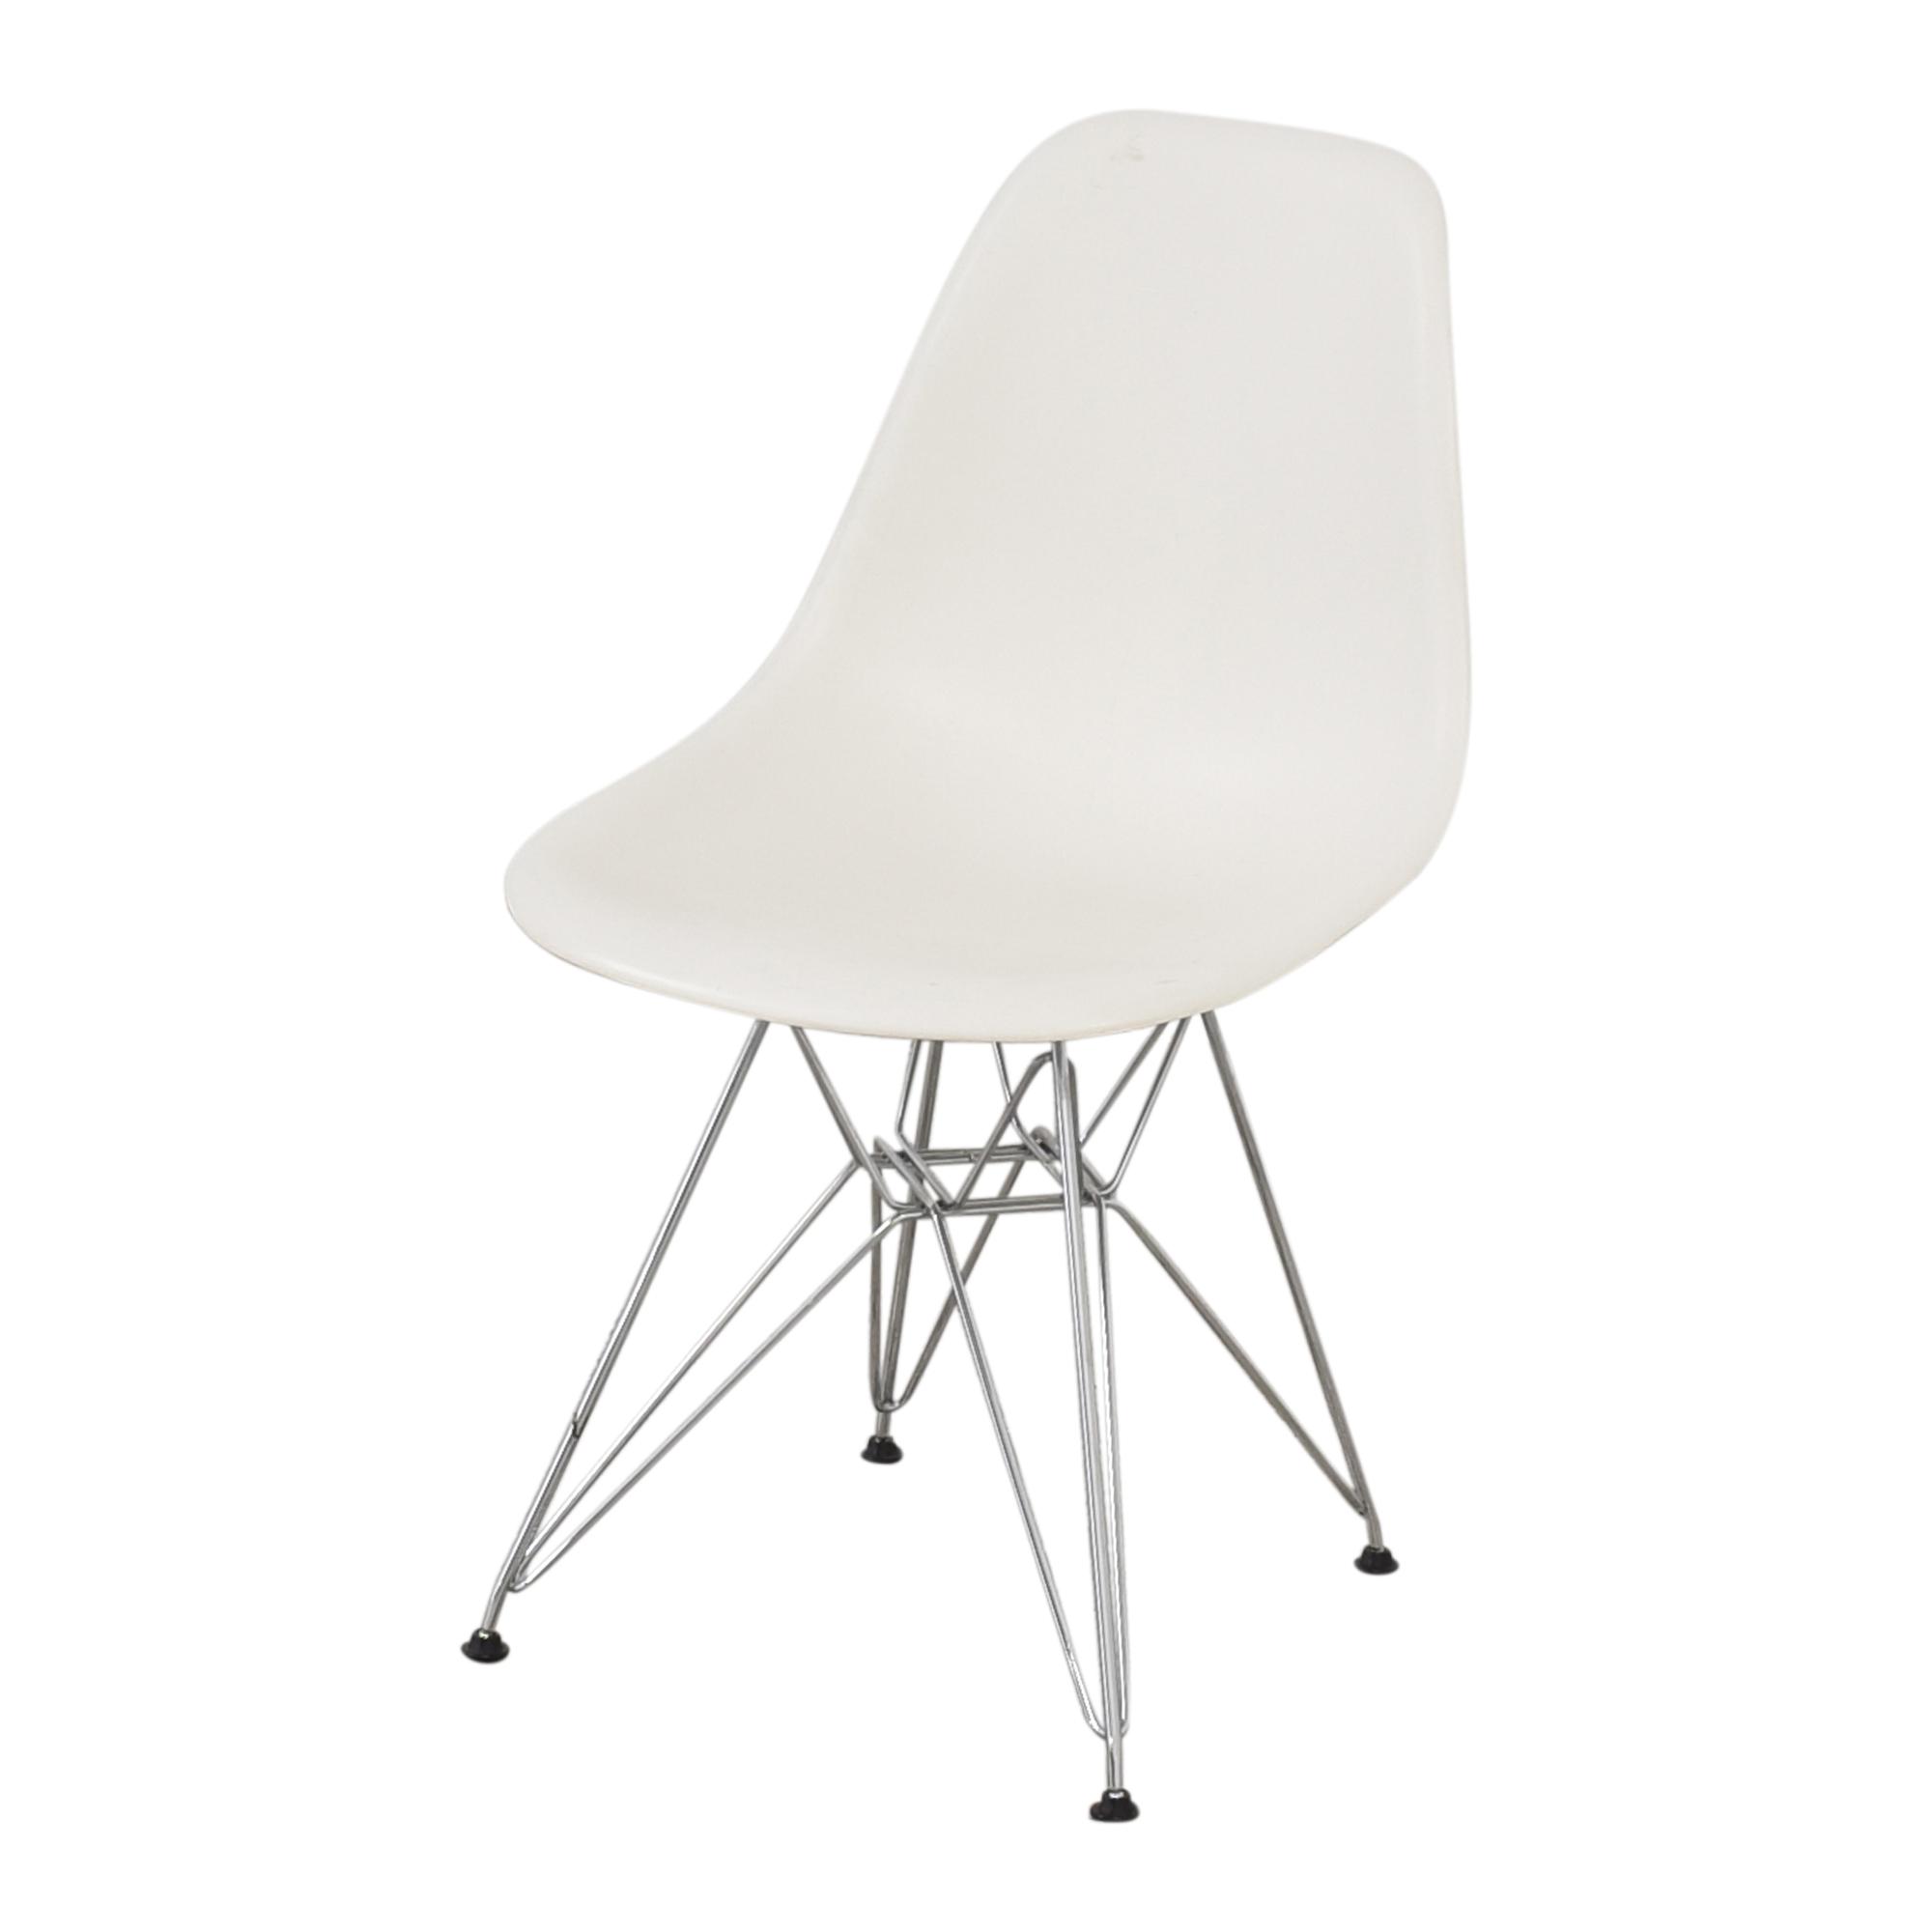 Herman Miller Herman Miller Eames Molded Side Chair nj